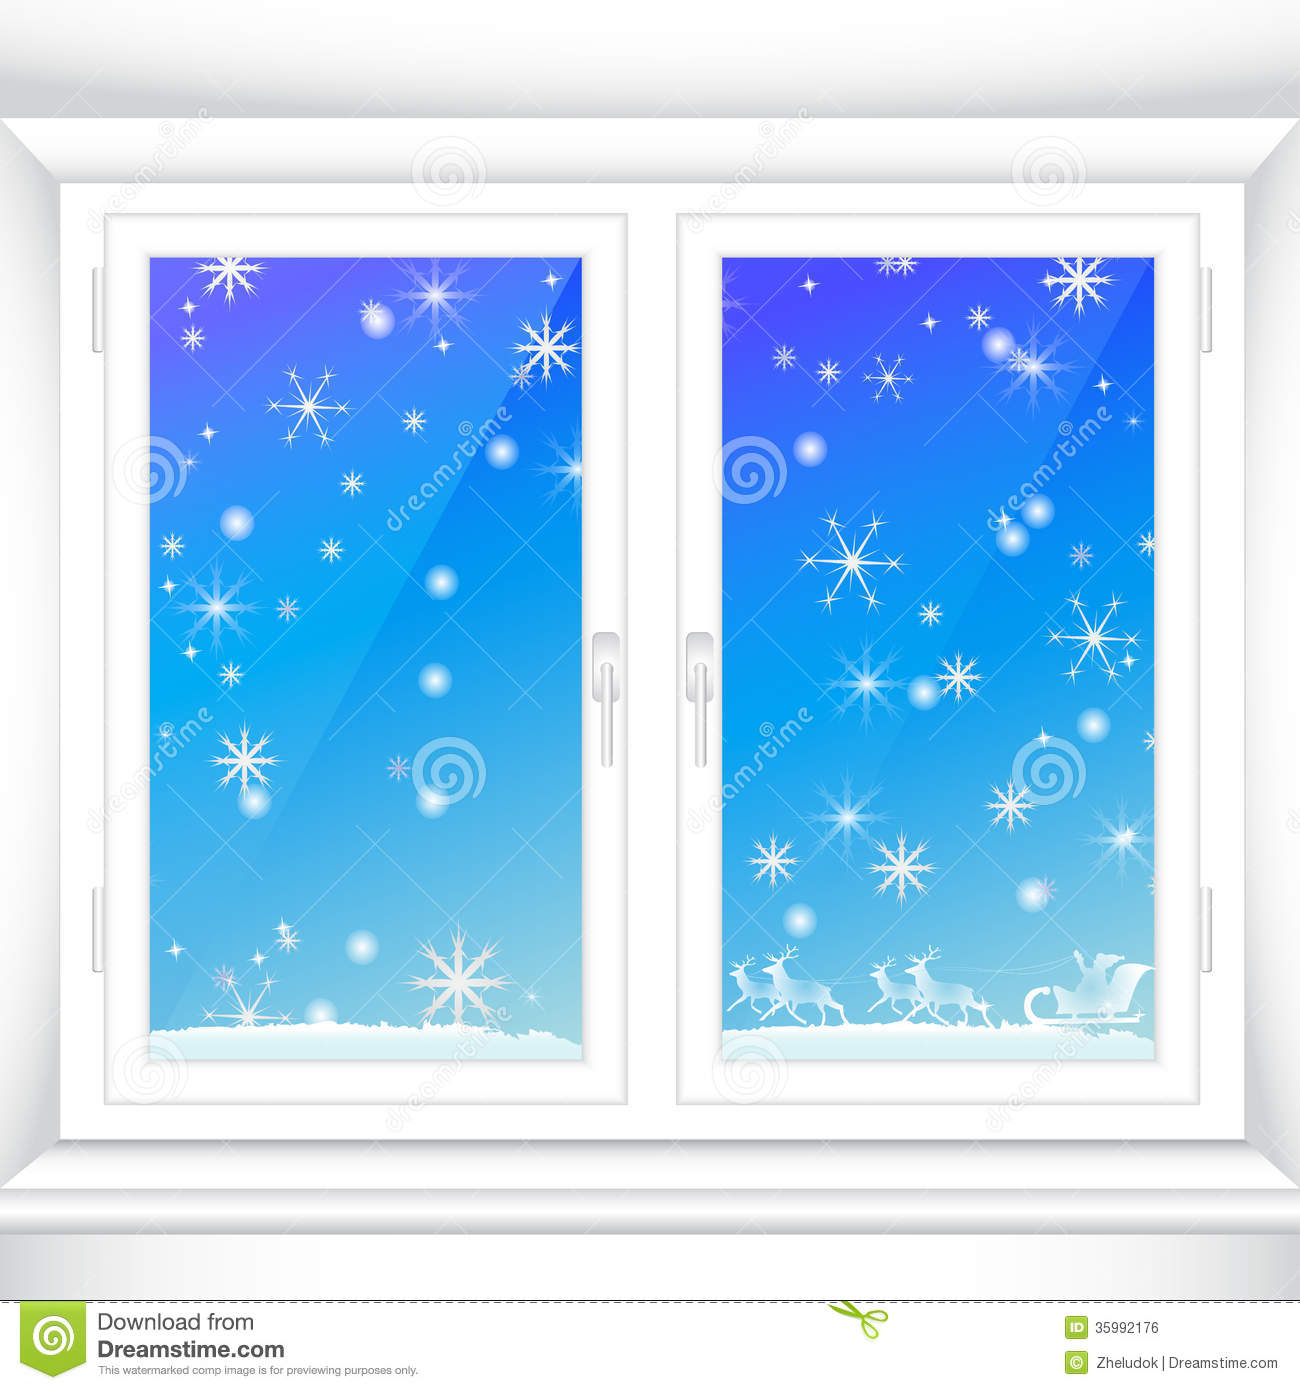 Open Window Clipart Clipart Suggest: Winter Window Clipart